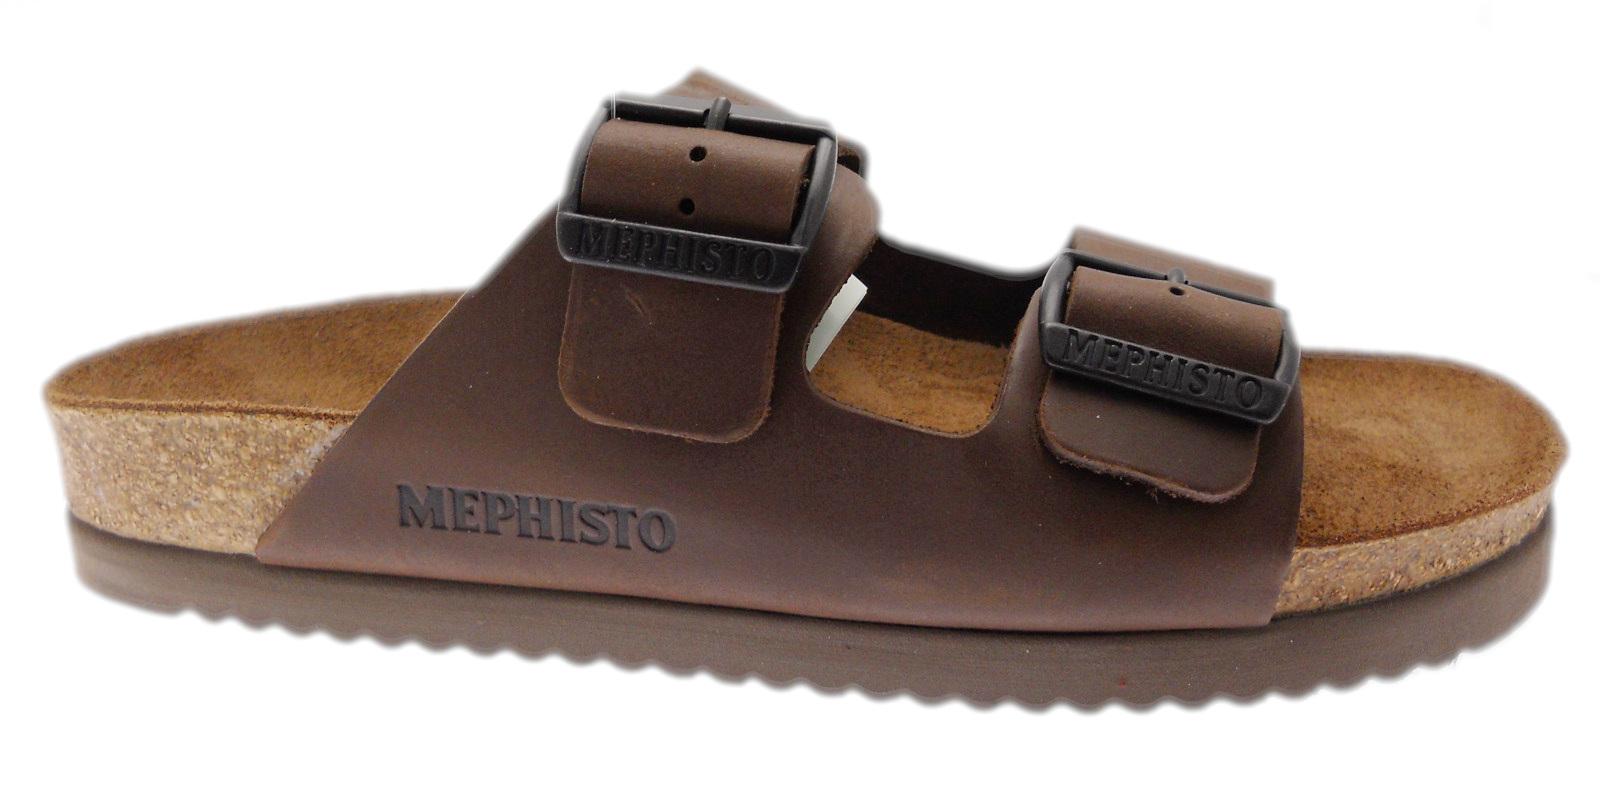 MEPHISTO NERIO ciabatta aperta con fibbie regolabili brown Mephisto